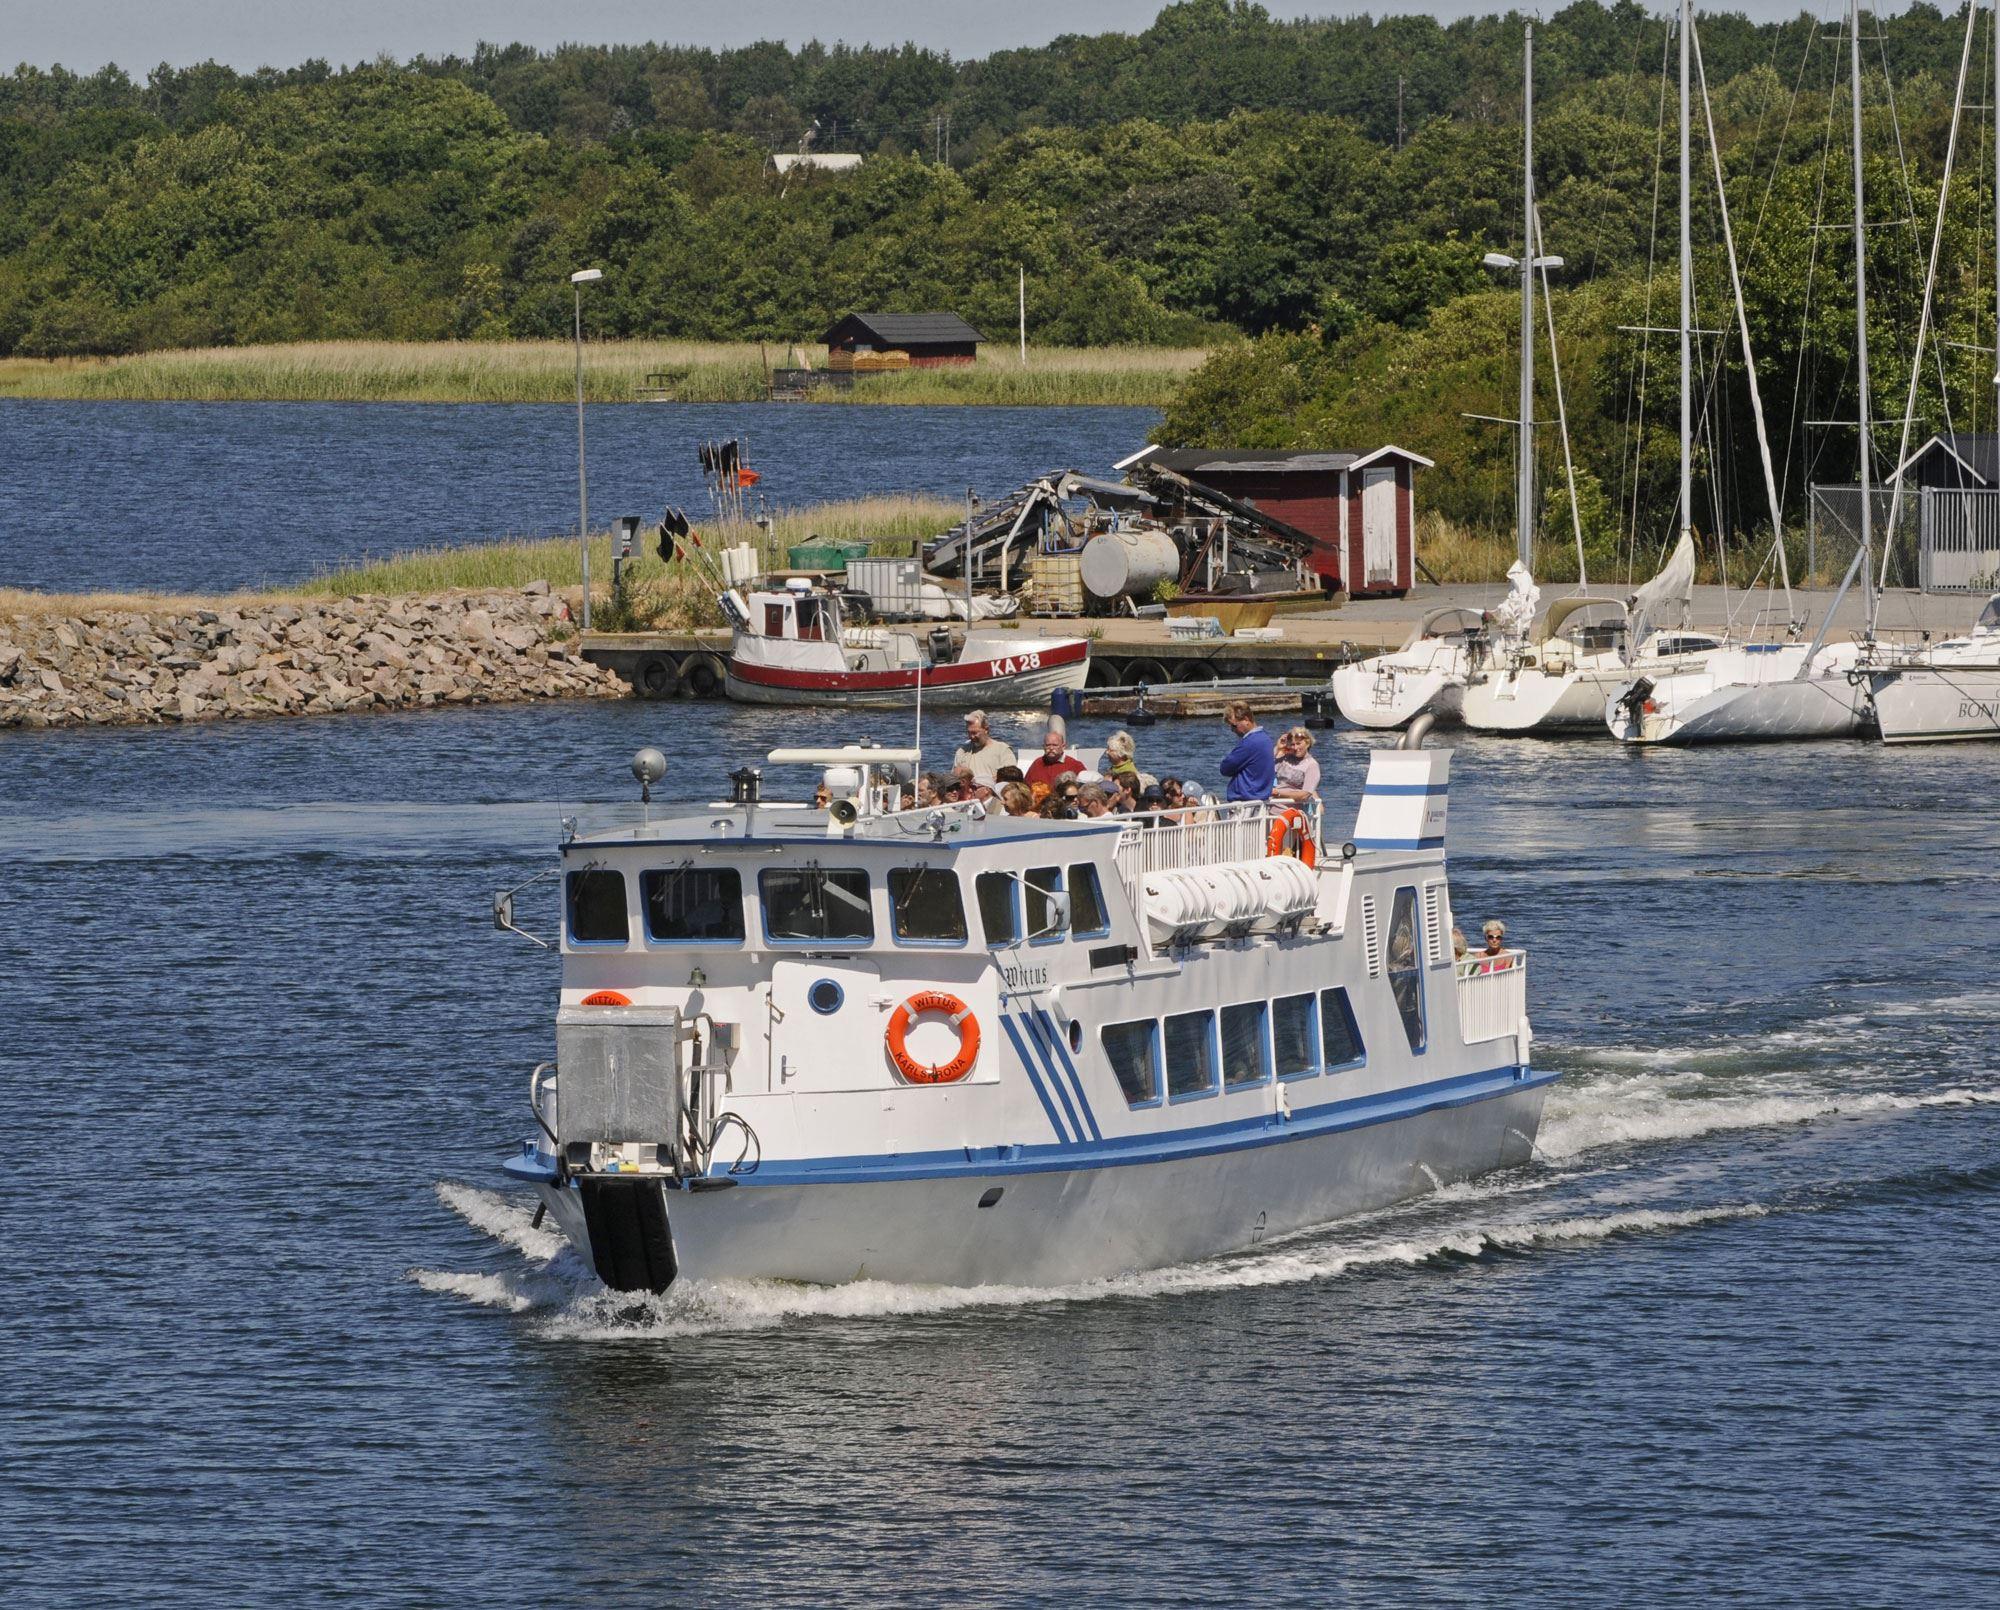 Archipelago boat tours - charter